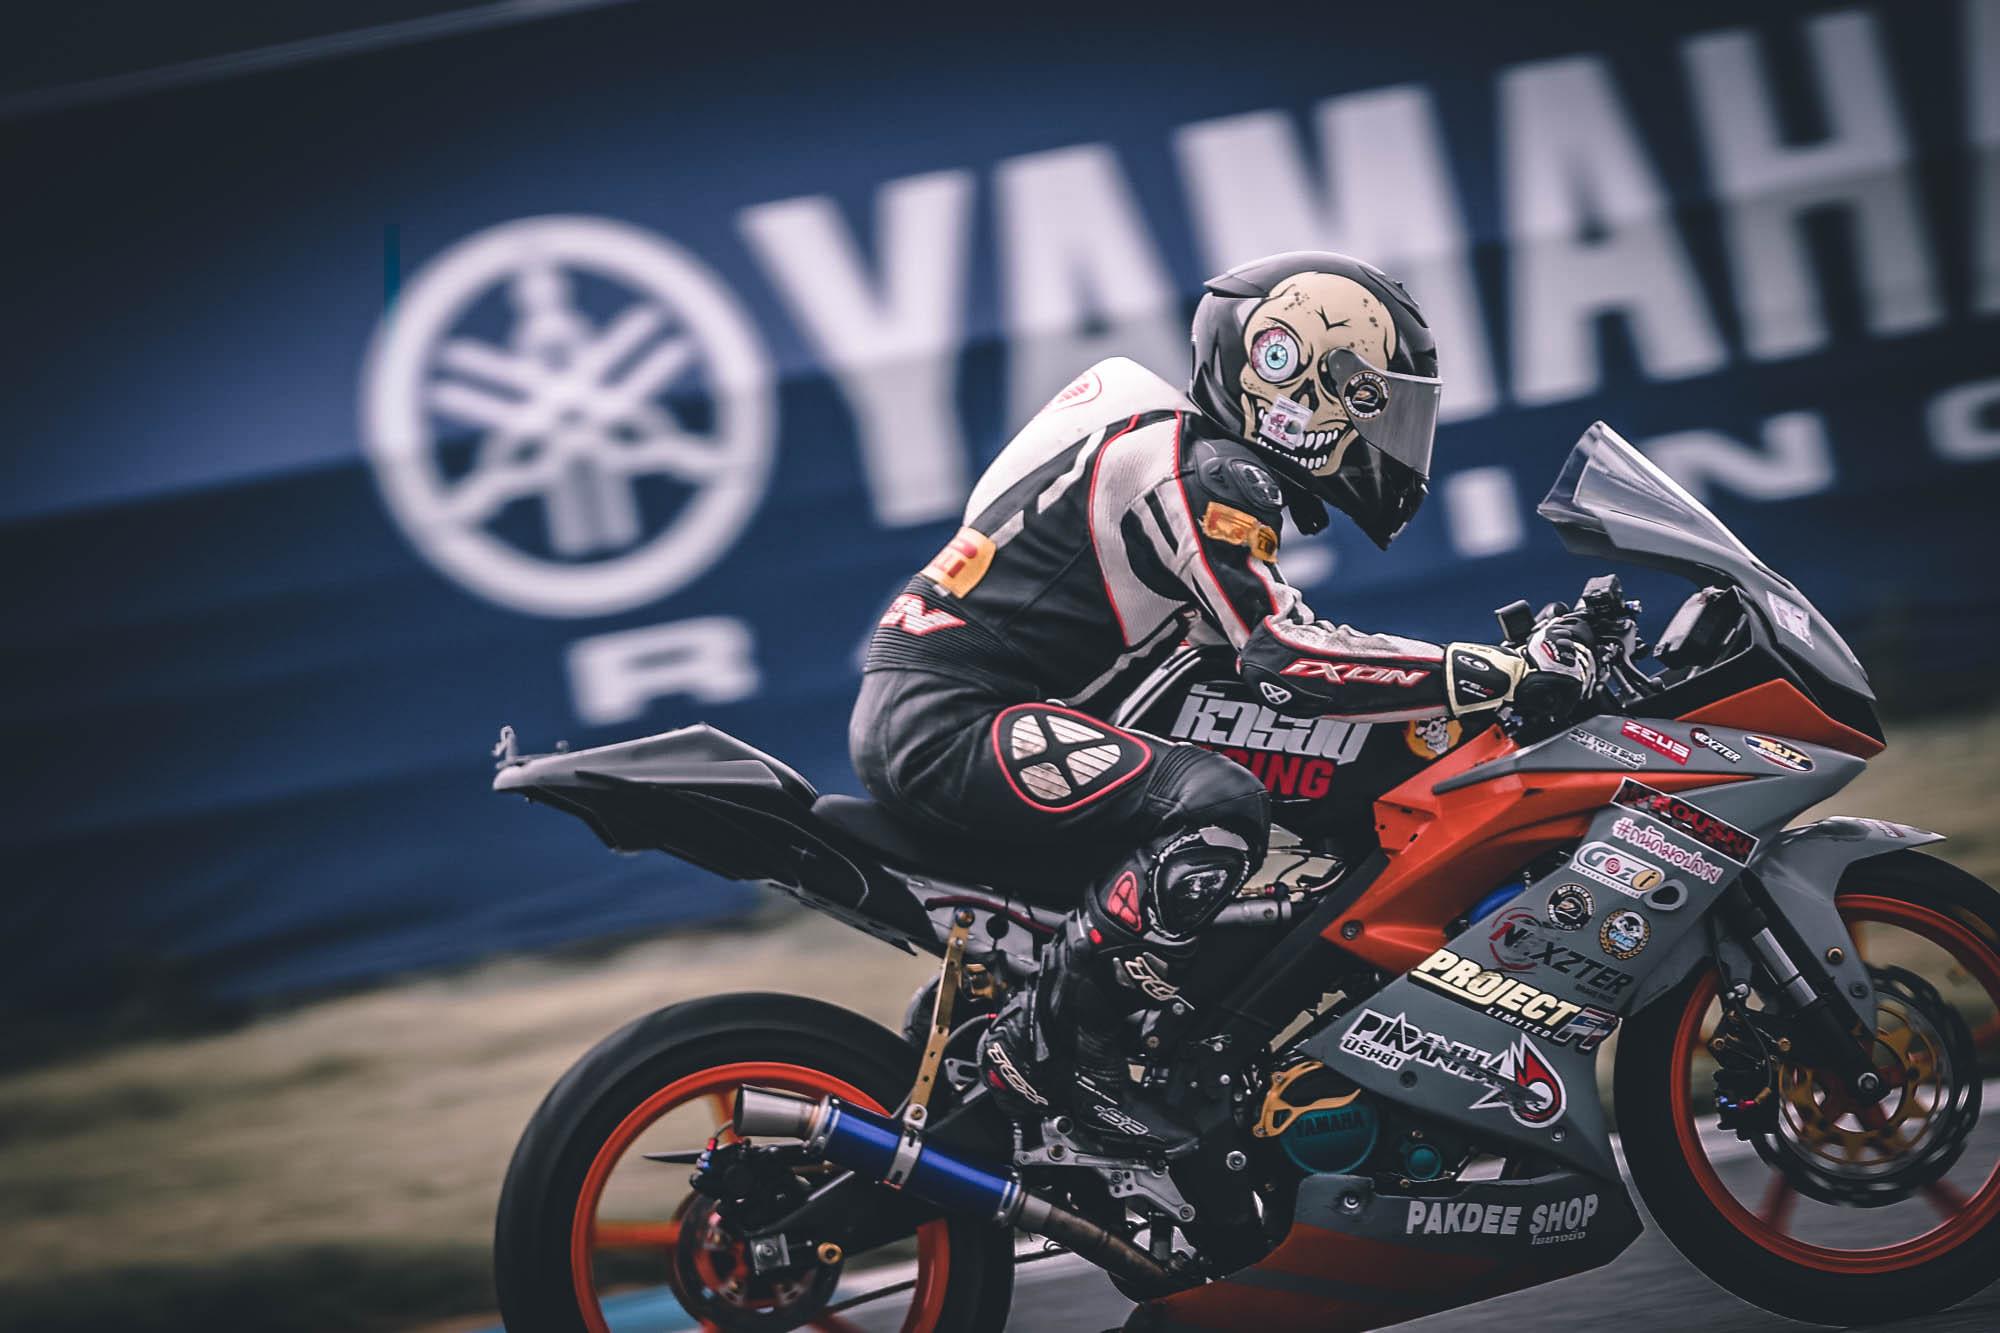 PIRANHA X หัวร้อนRacingTeam เก็บตกภาพ Yamaha Championship 2020 สนามที่ 1